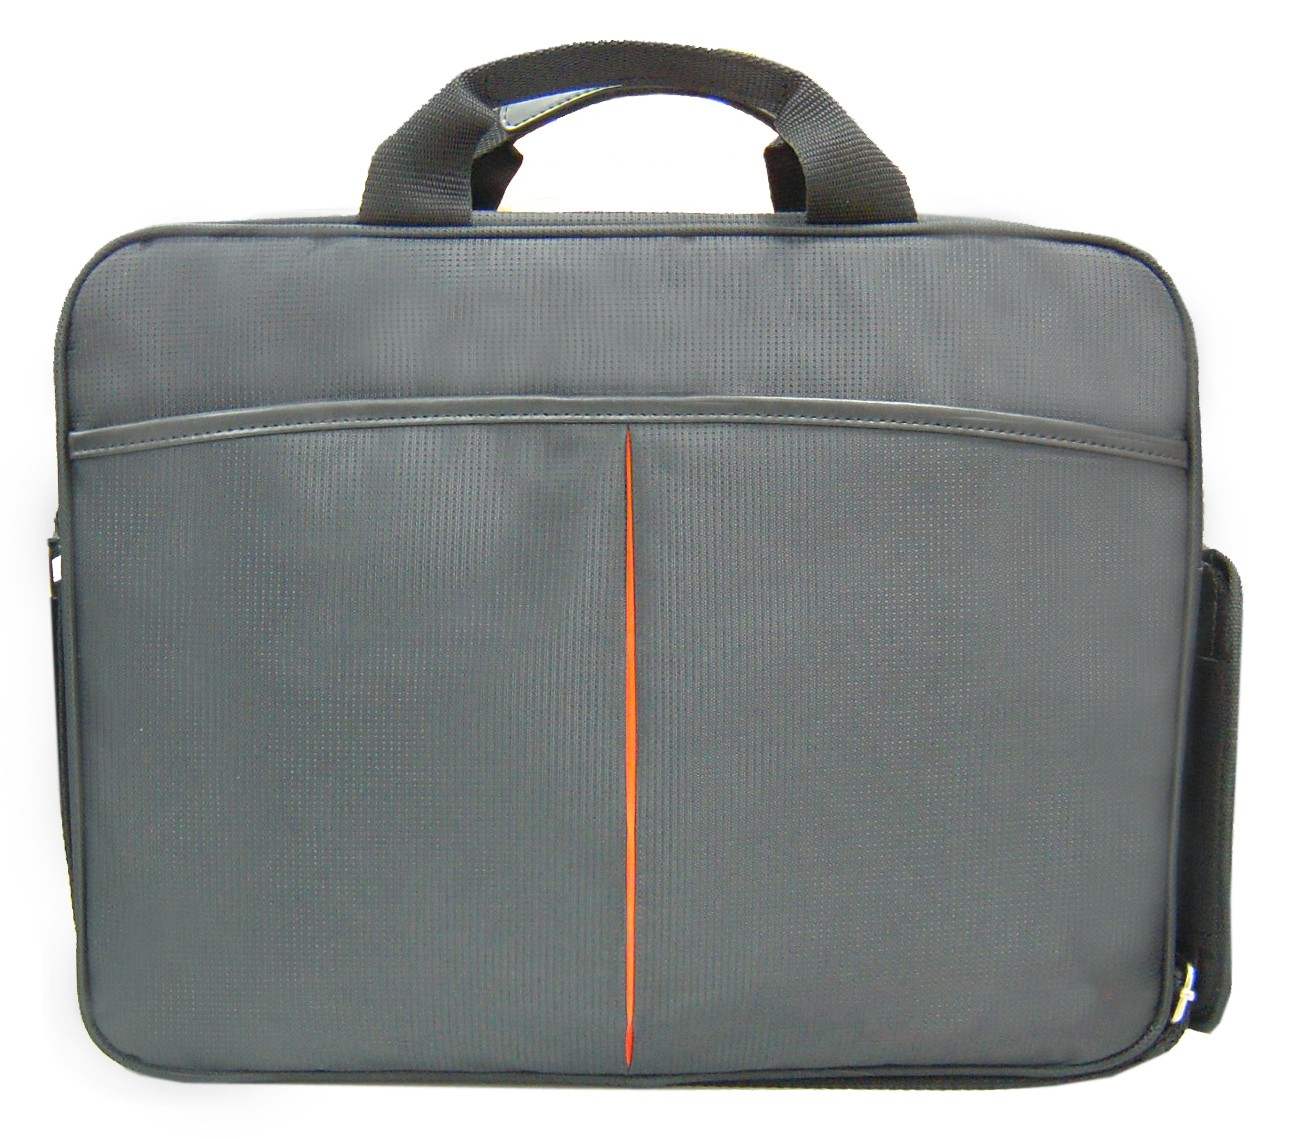 (ANT-0019)商務款-簡約手提兩用電腦包(D款)/Business-portable computer bag